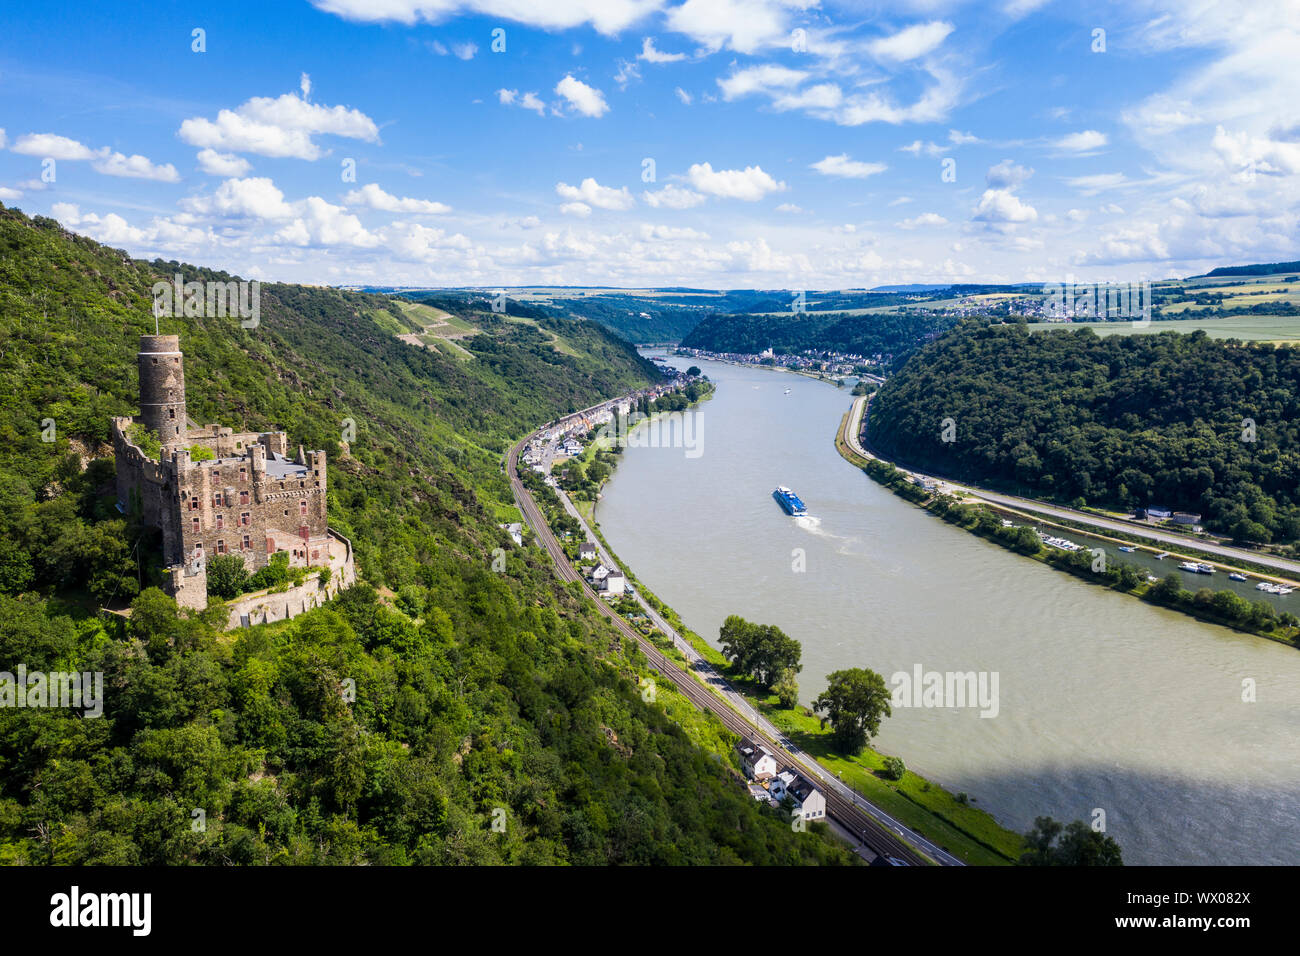 Castle Maus overlooking the Rhine river, UNESCO World Heritage Site, Middle Rhine valley, Rhineland-Palatinate, Germany, Europe Stock Photo